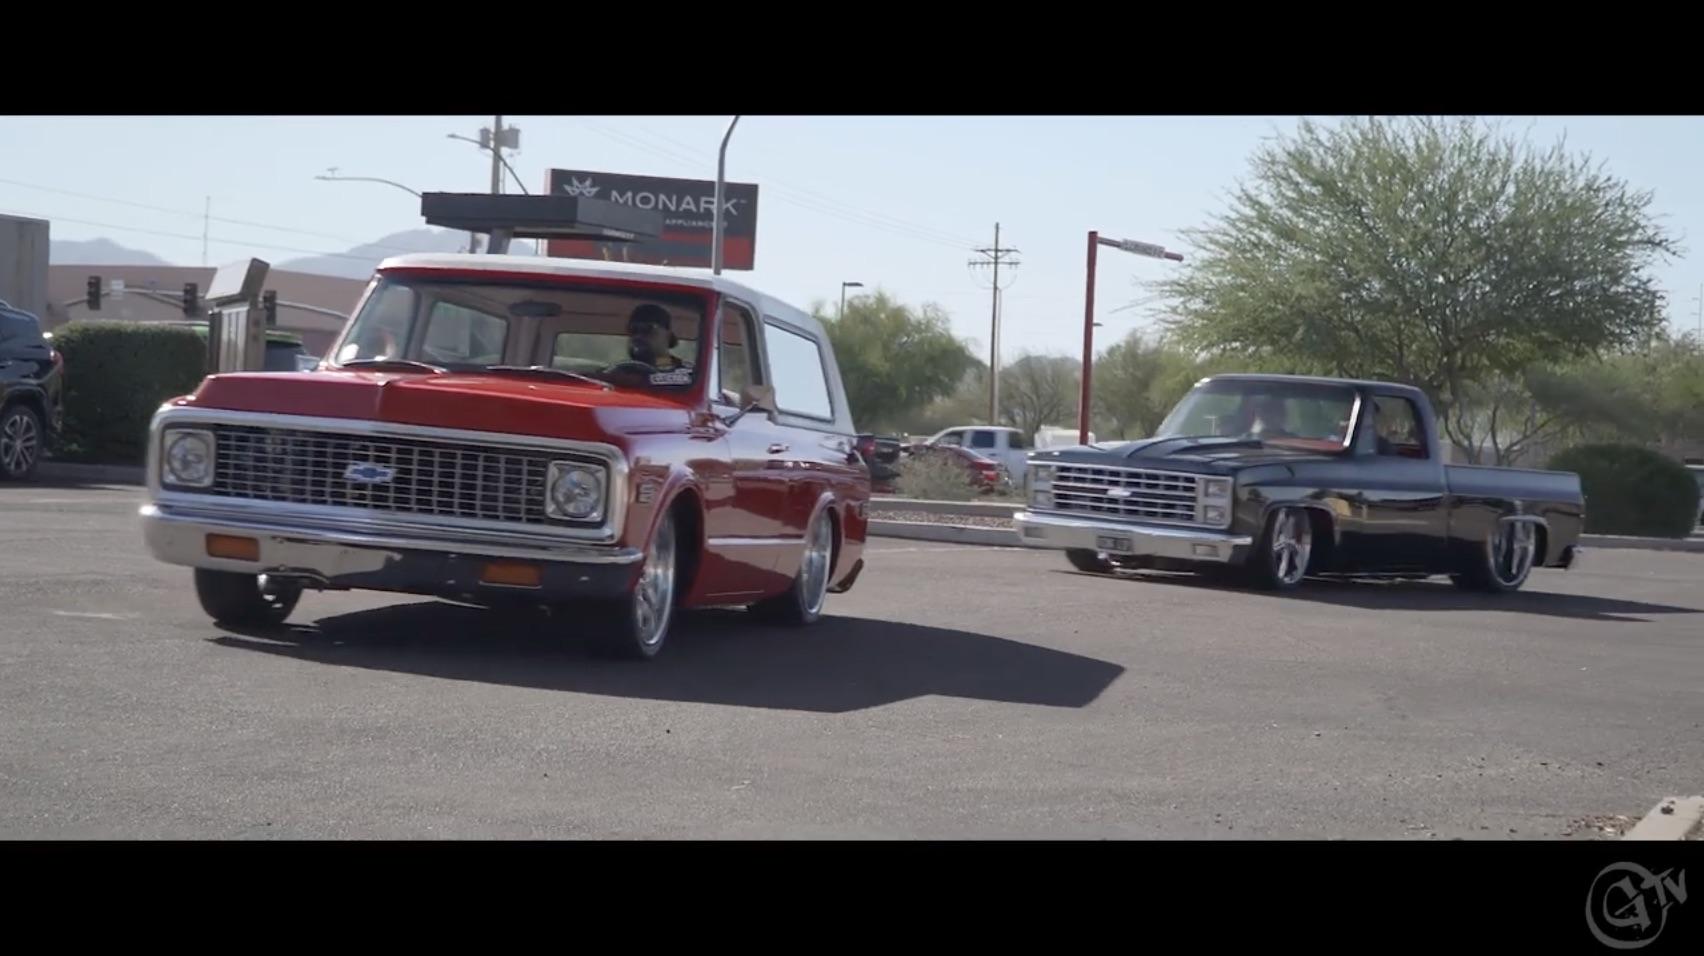 Dino's Git Down 2019: The Floodgates Of Killer GM Trucks Was Wide Open In Arizona!